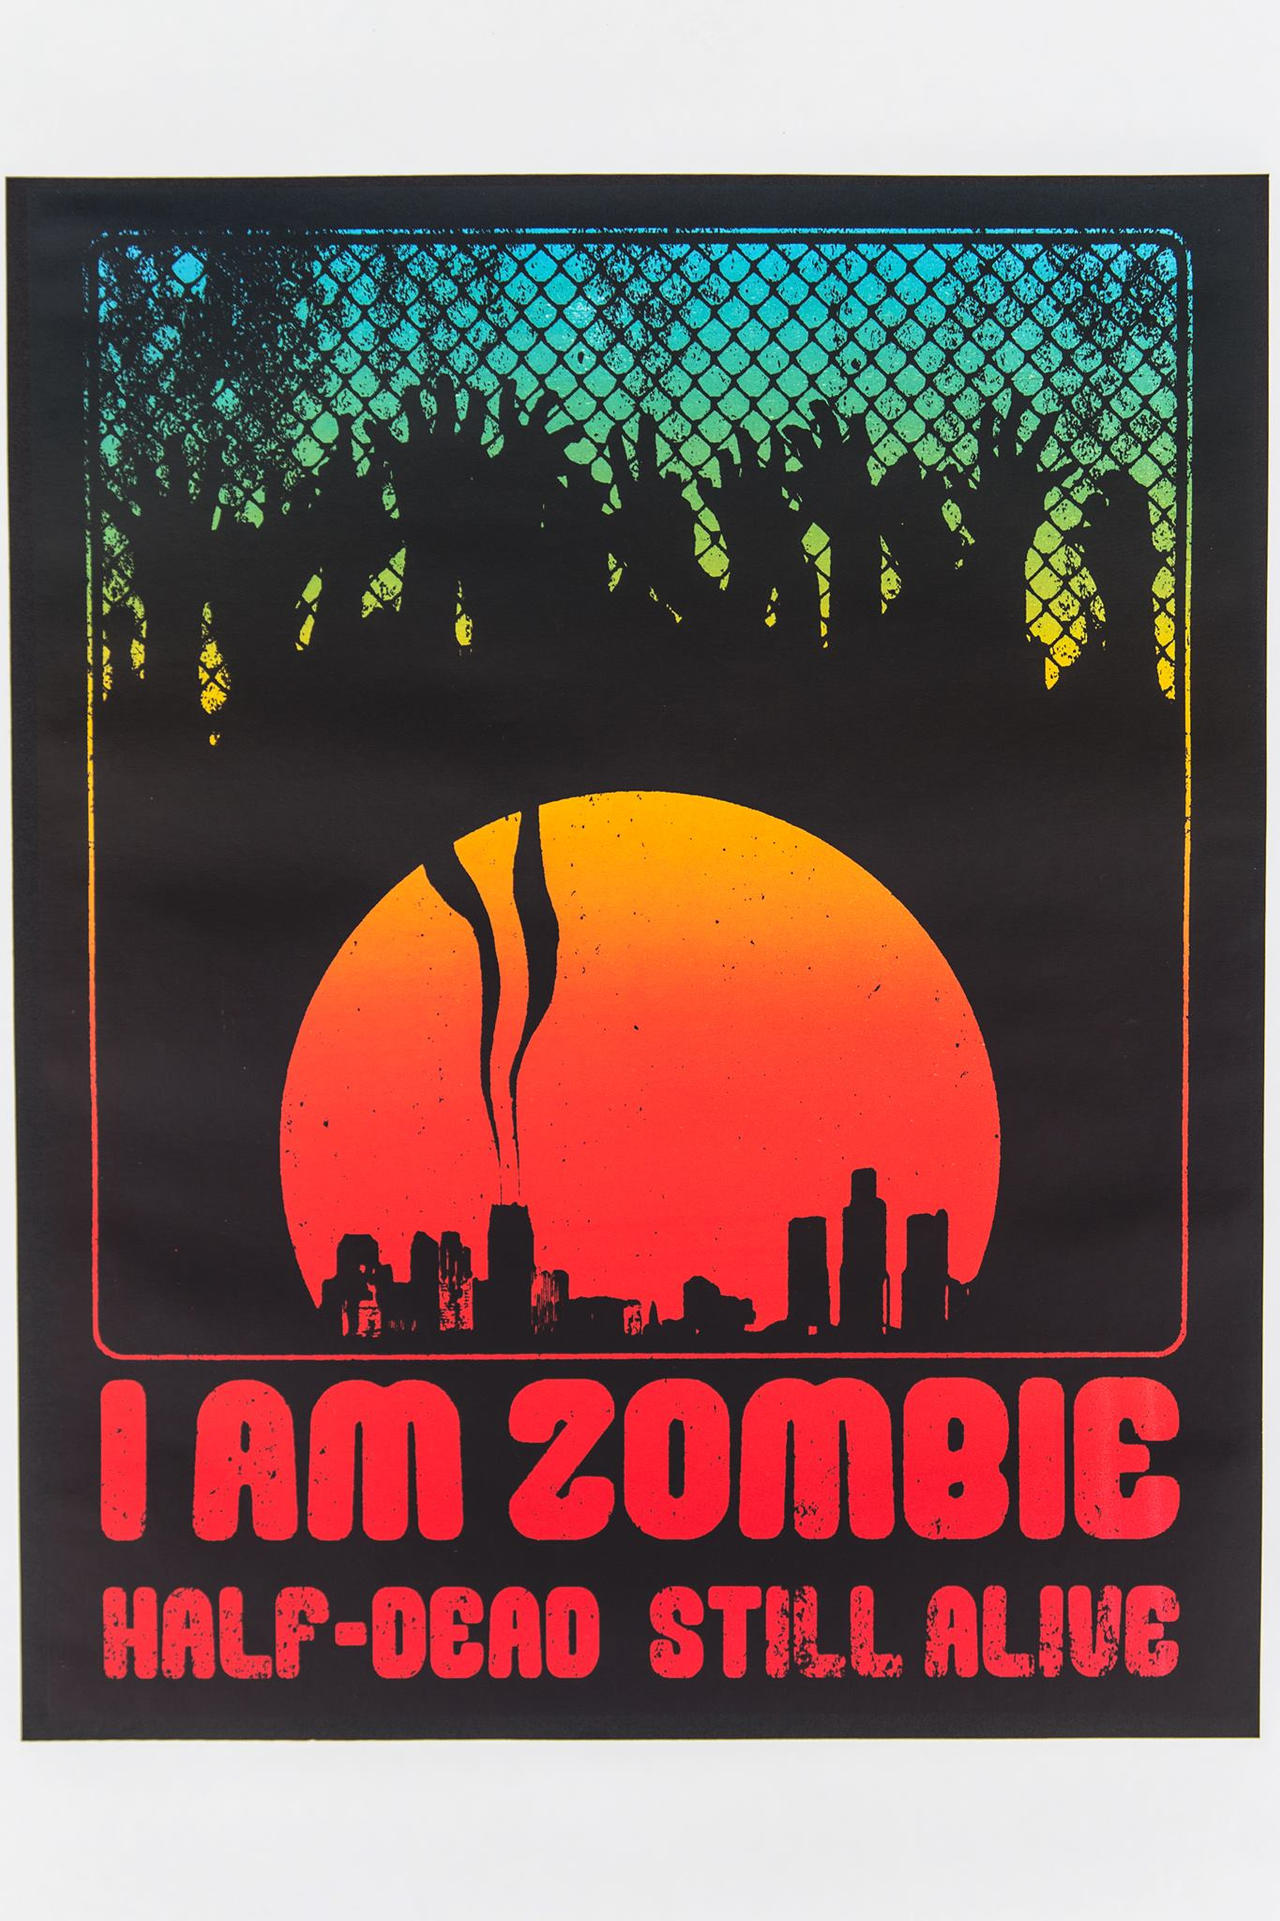 I AM ZOMBIE - Retro Poster by Z-GrimV